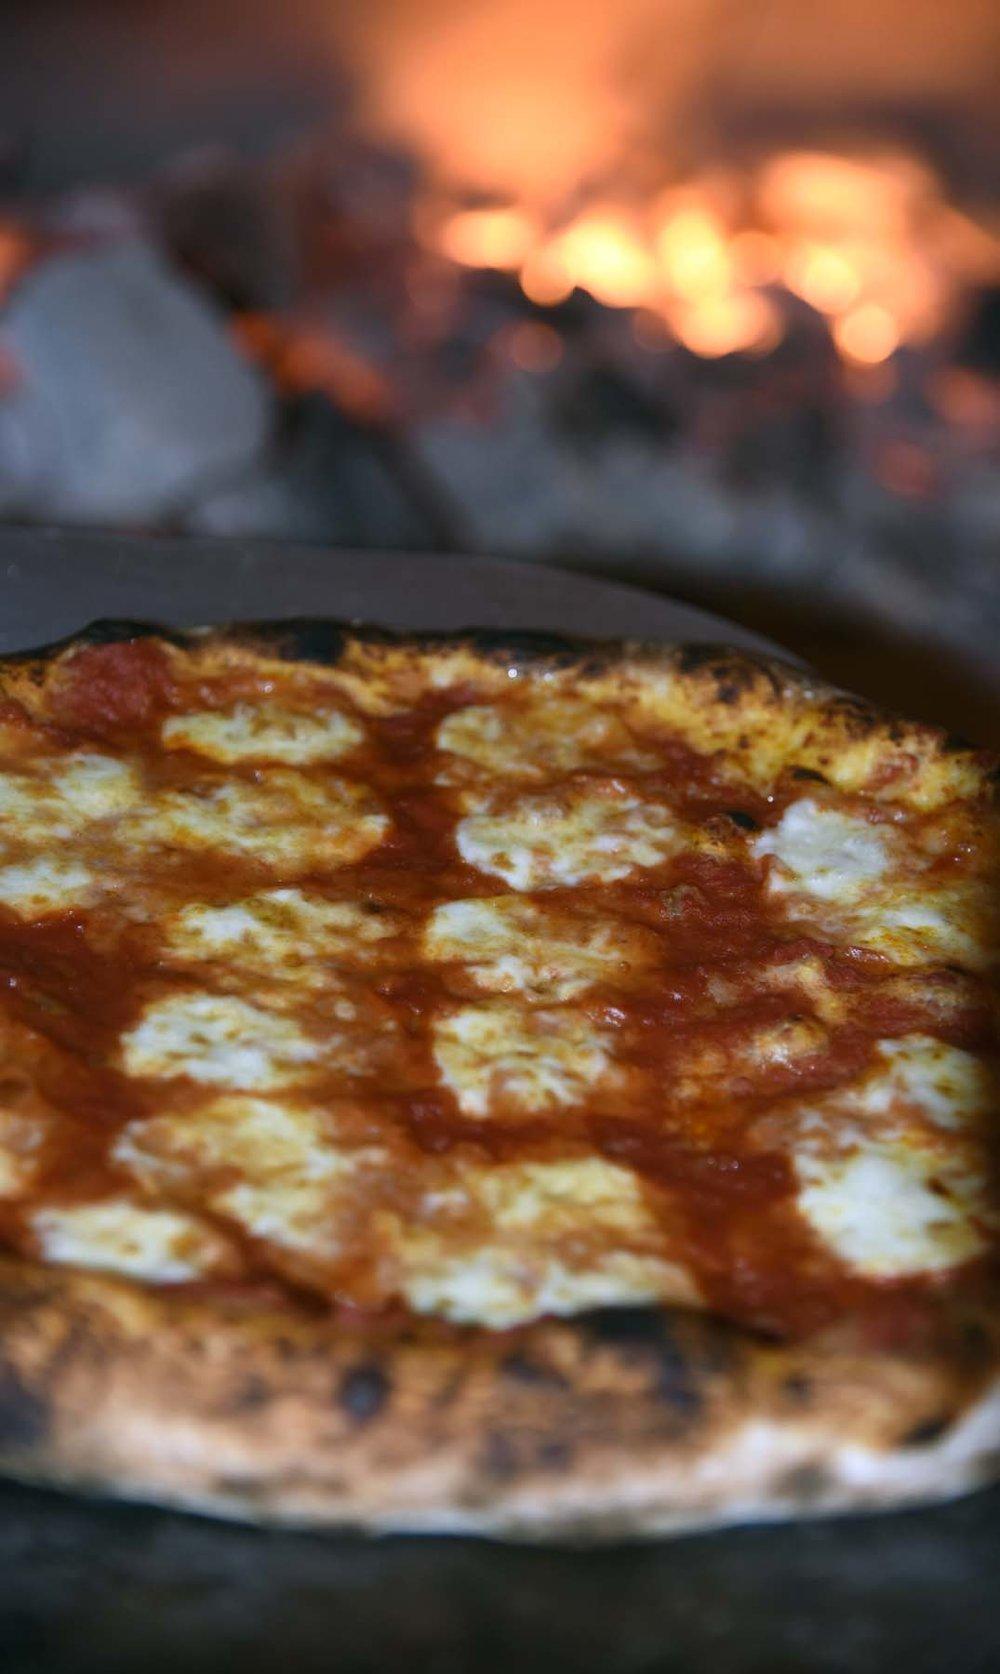 Coals-Artisan-Pizza-Louisville01.jpg